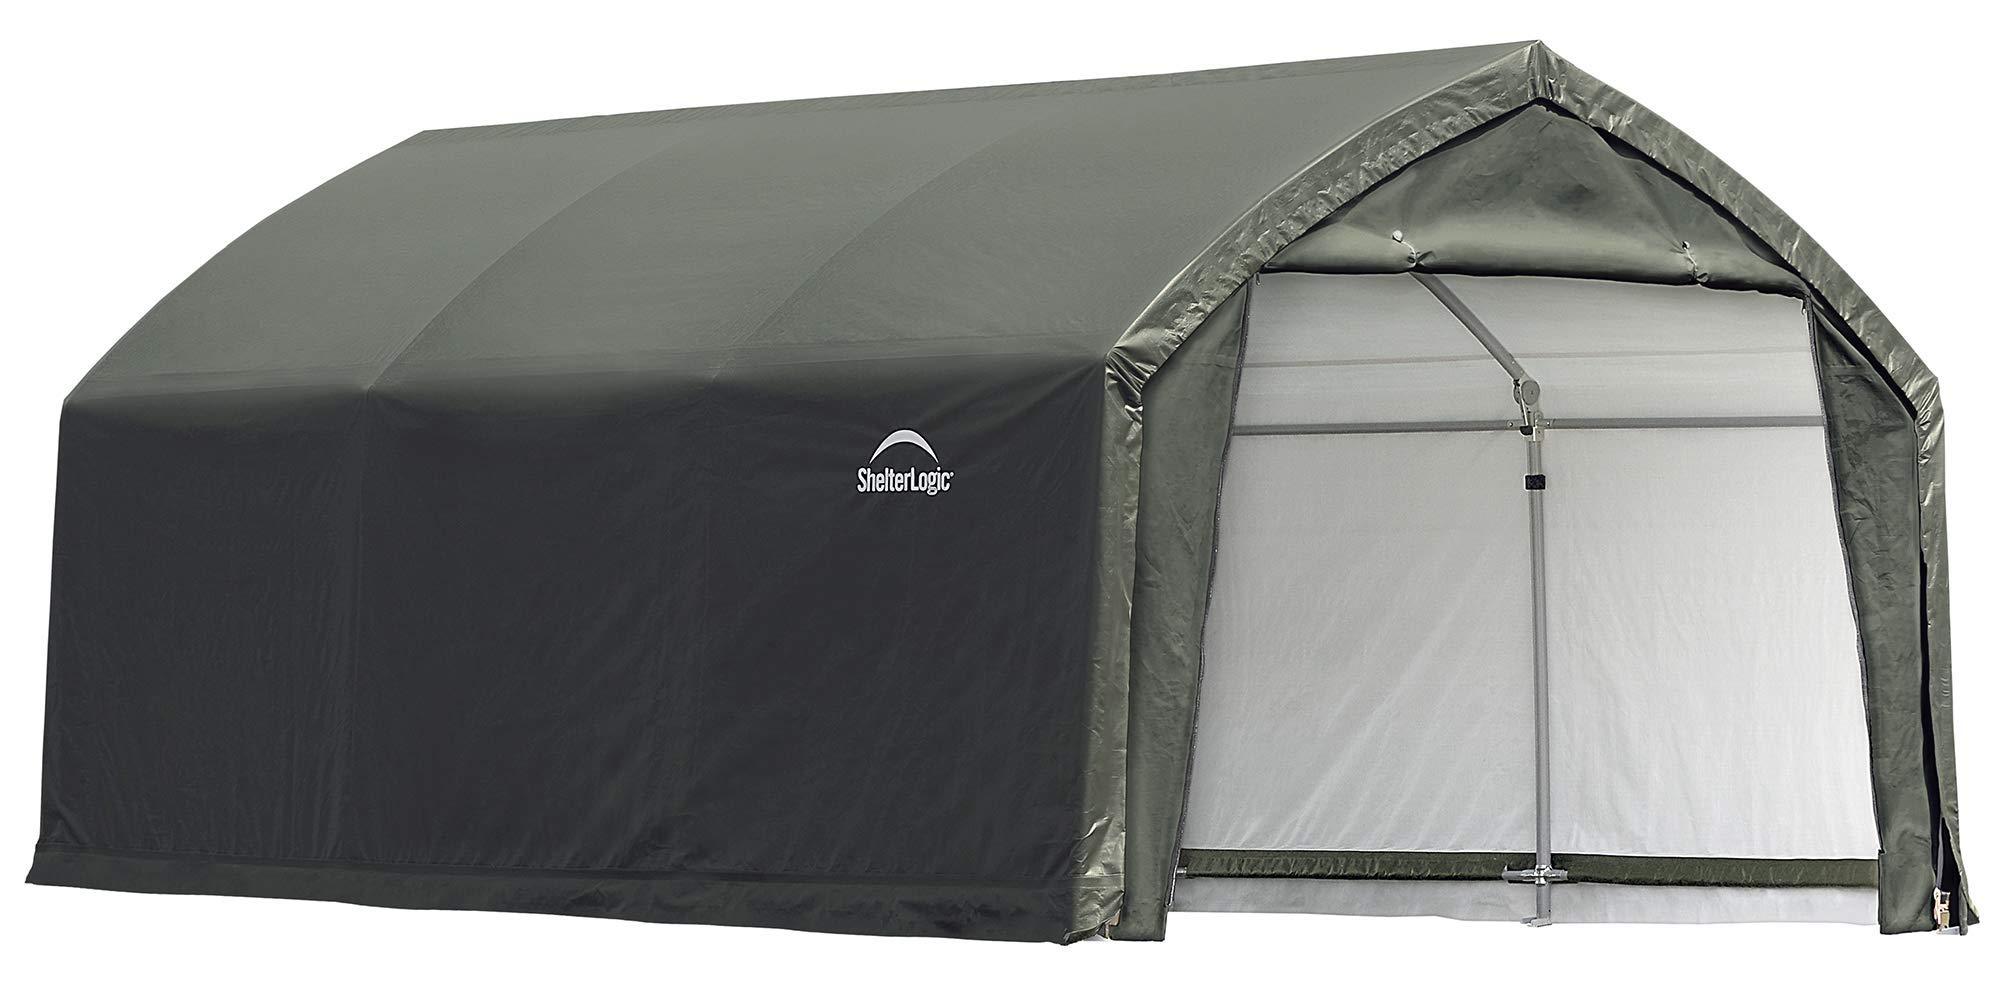 ShelterLogic 84558 Shelter ft Garage, 12 x 15 x 9'. , green